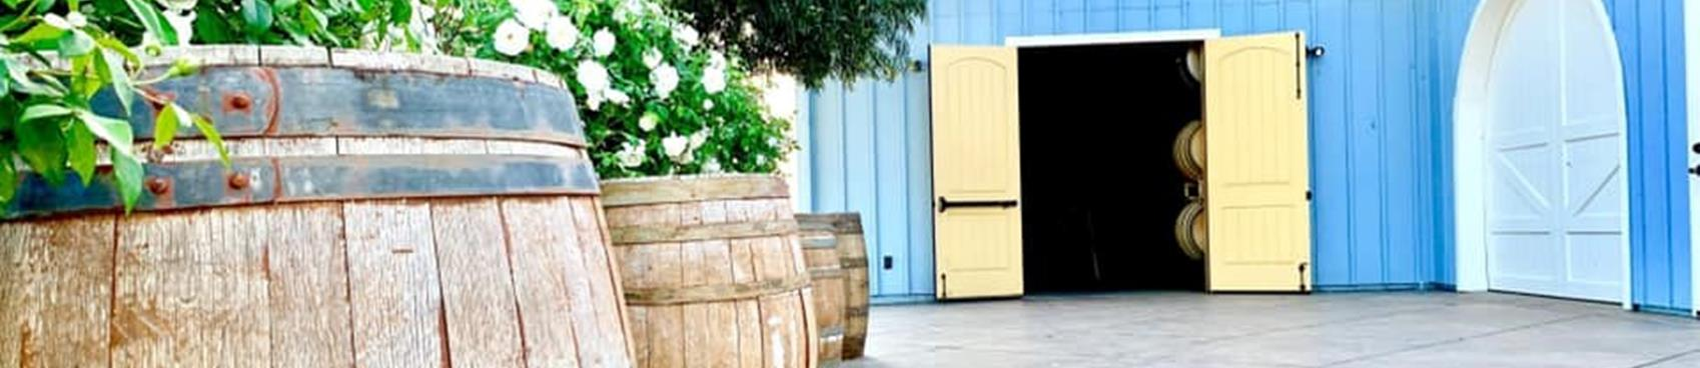 Purchase Tickets to Barrel Blending at Vezer Family Vineyard on CellarPass